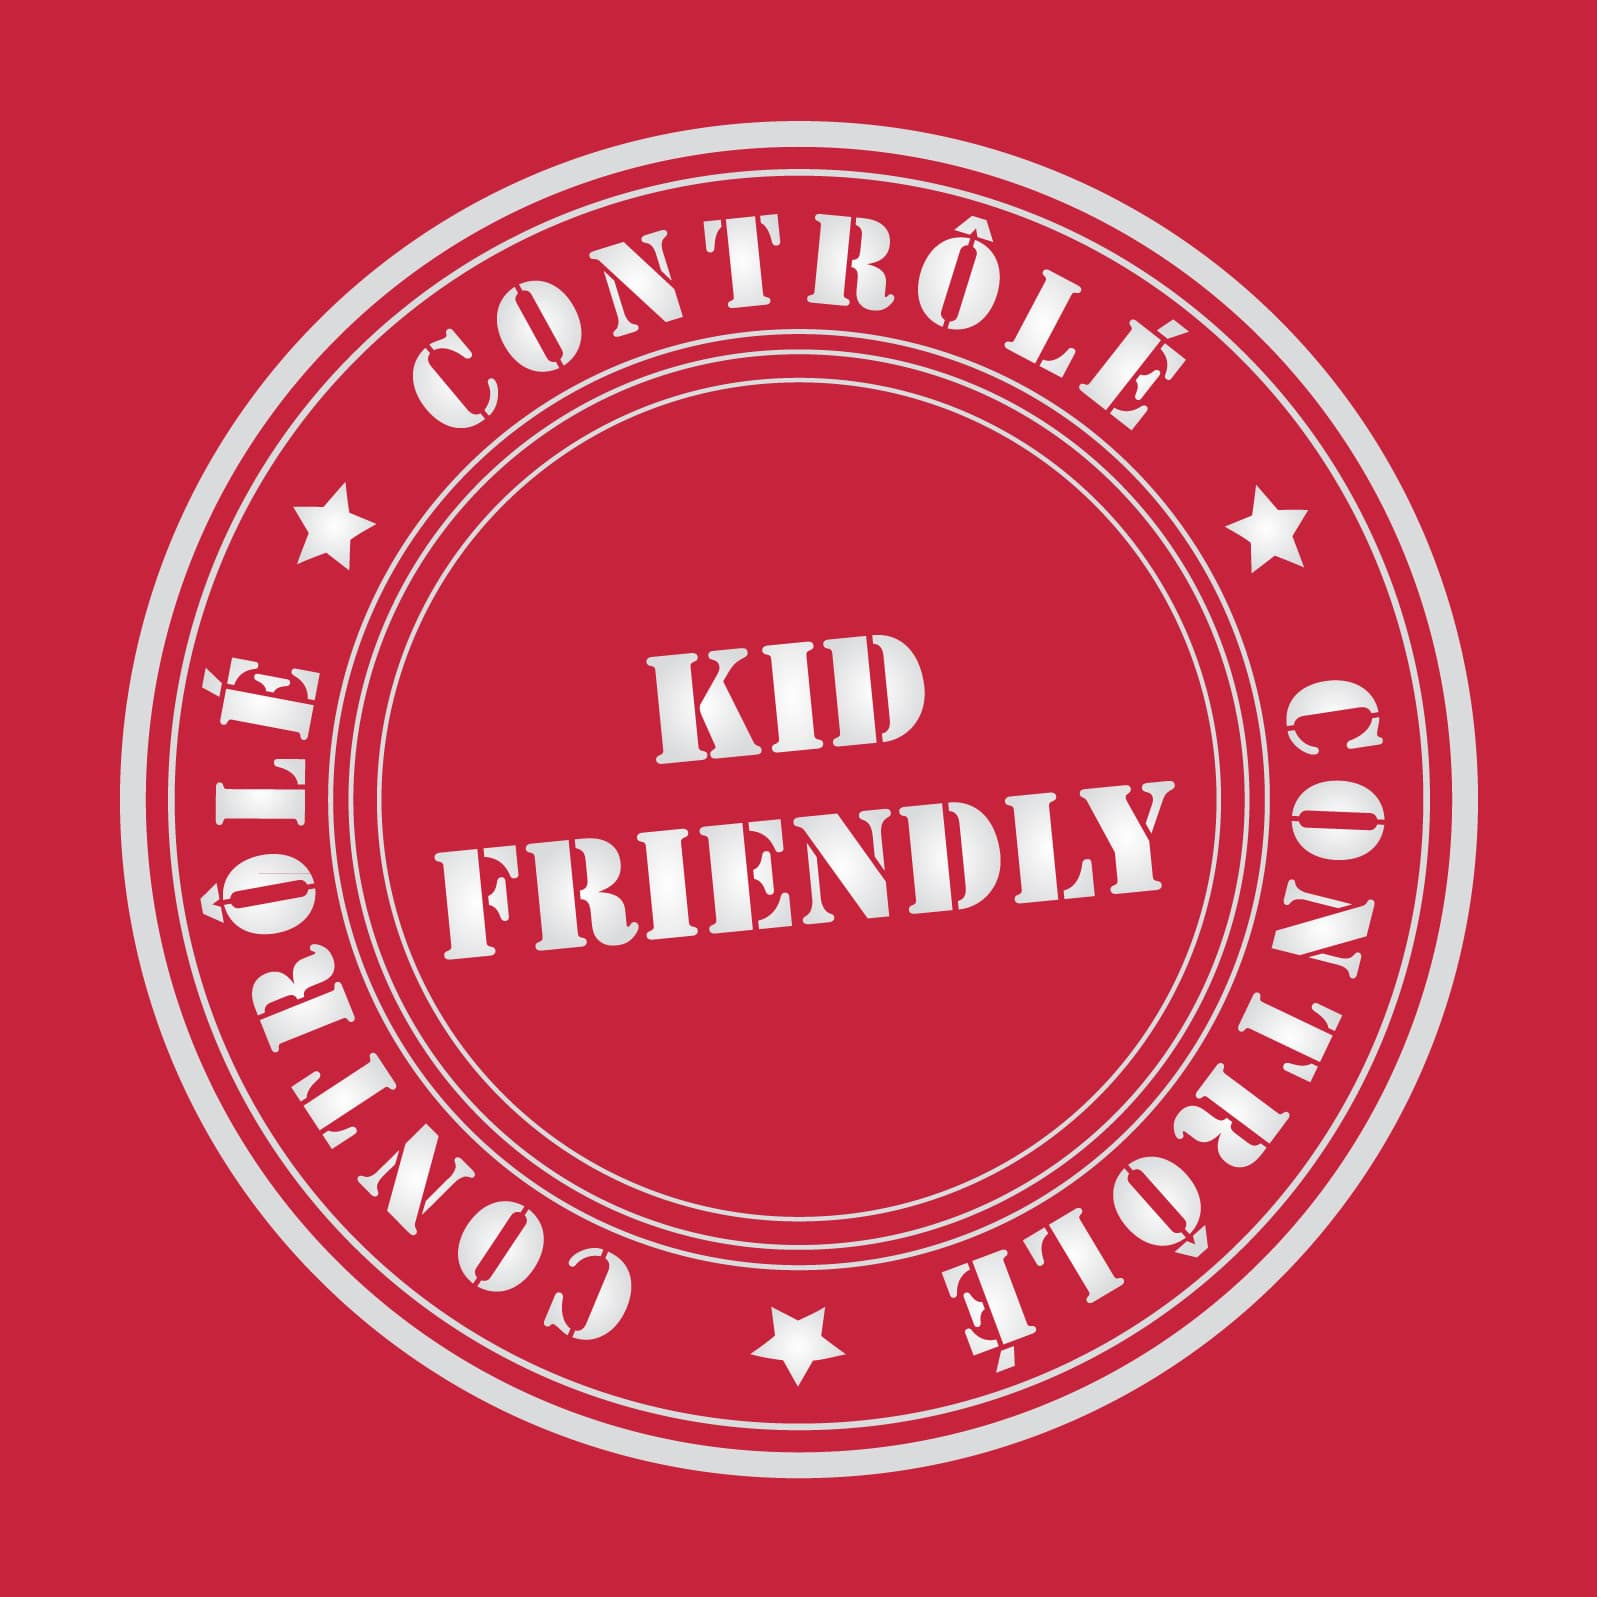 tampon kid friendly